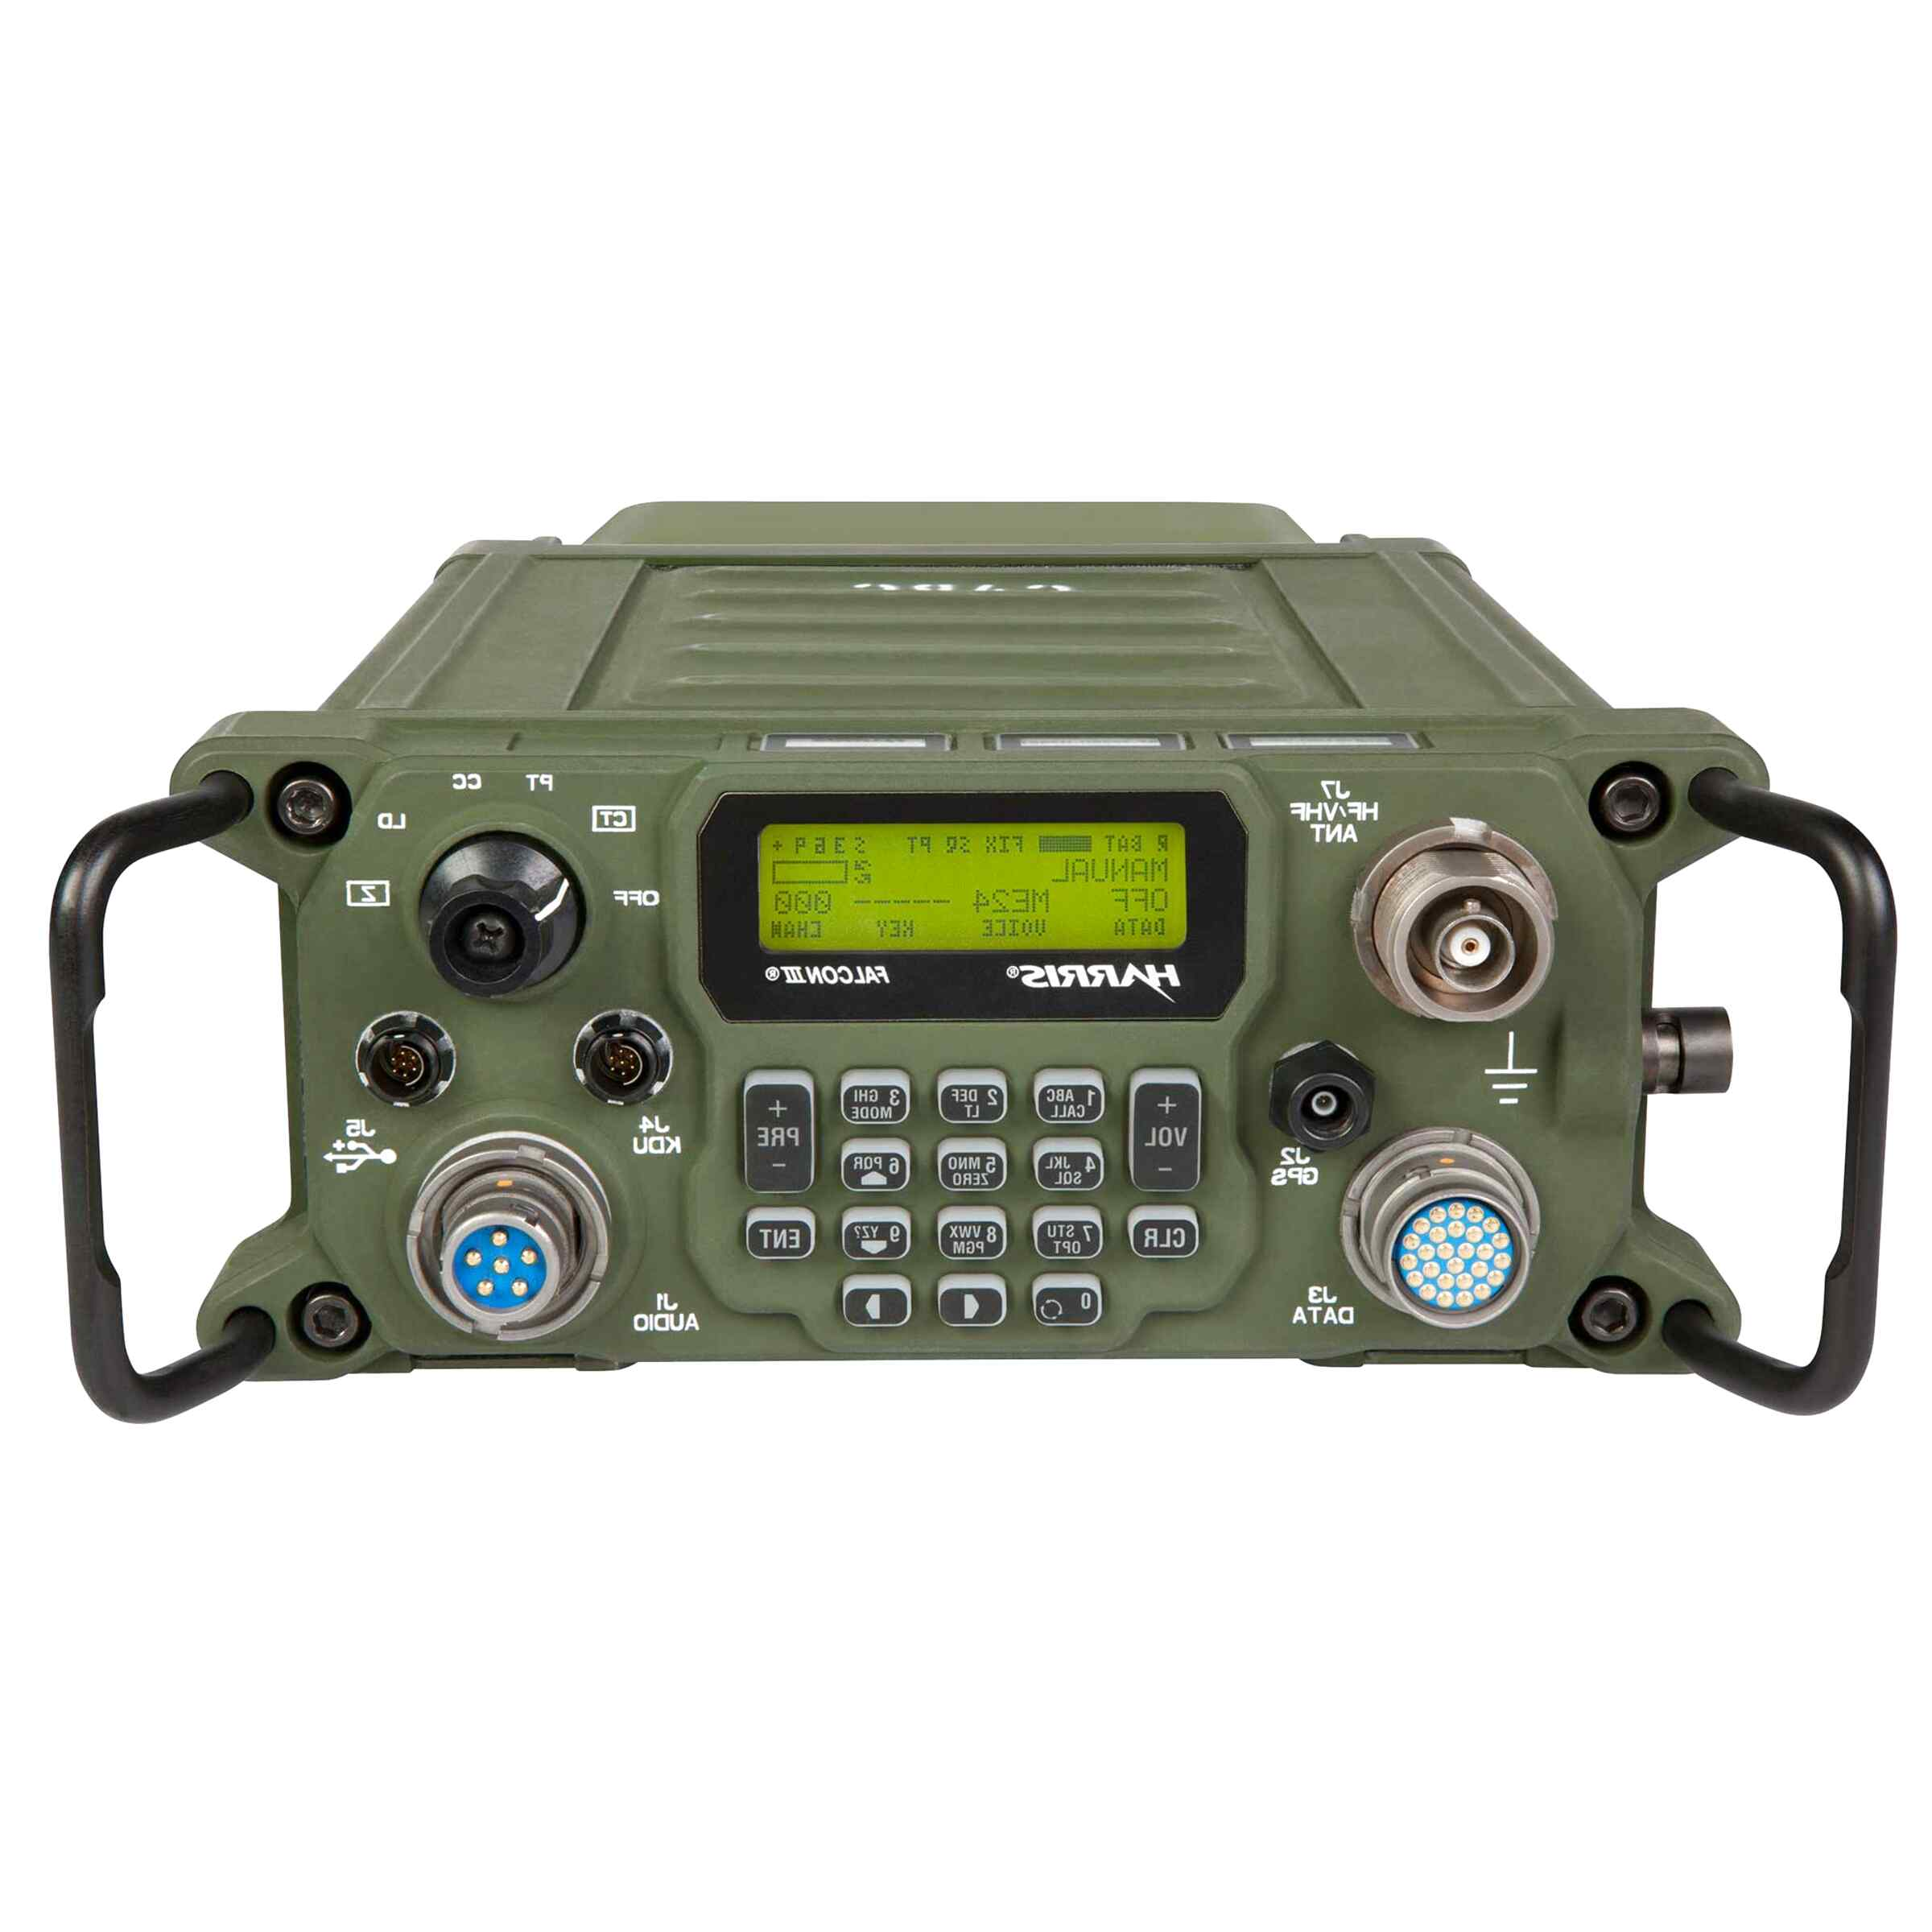 manpack radio for sale